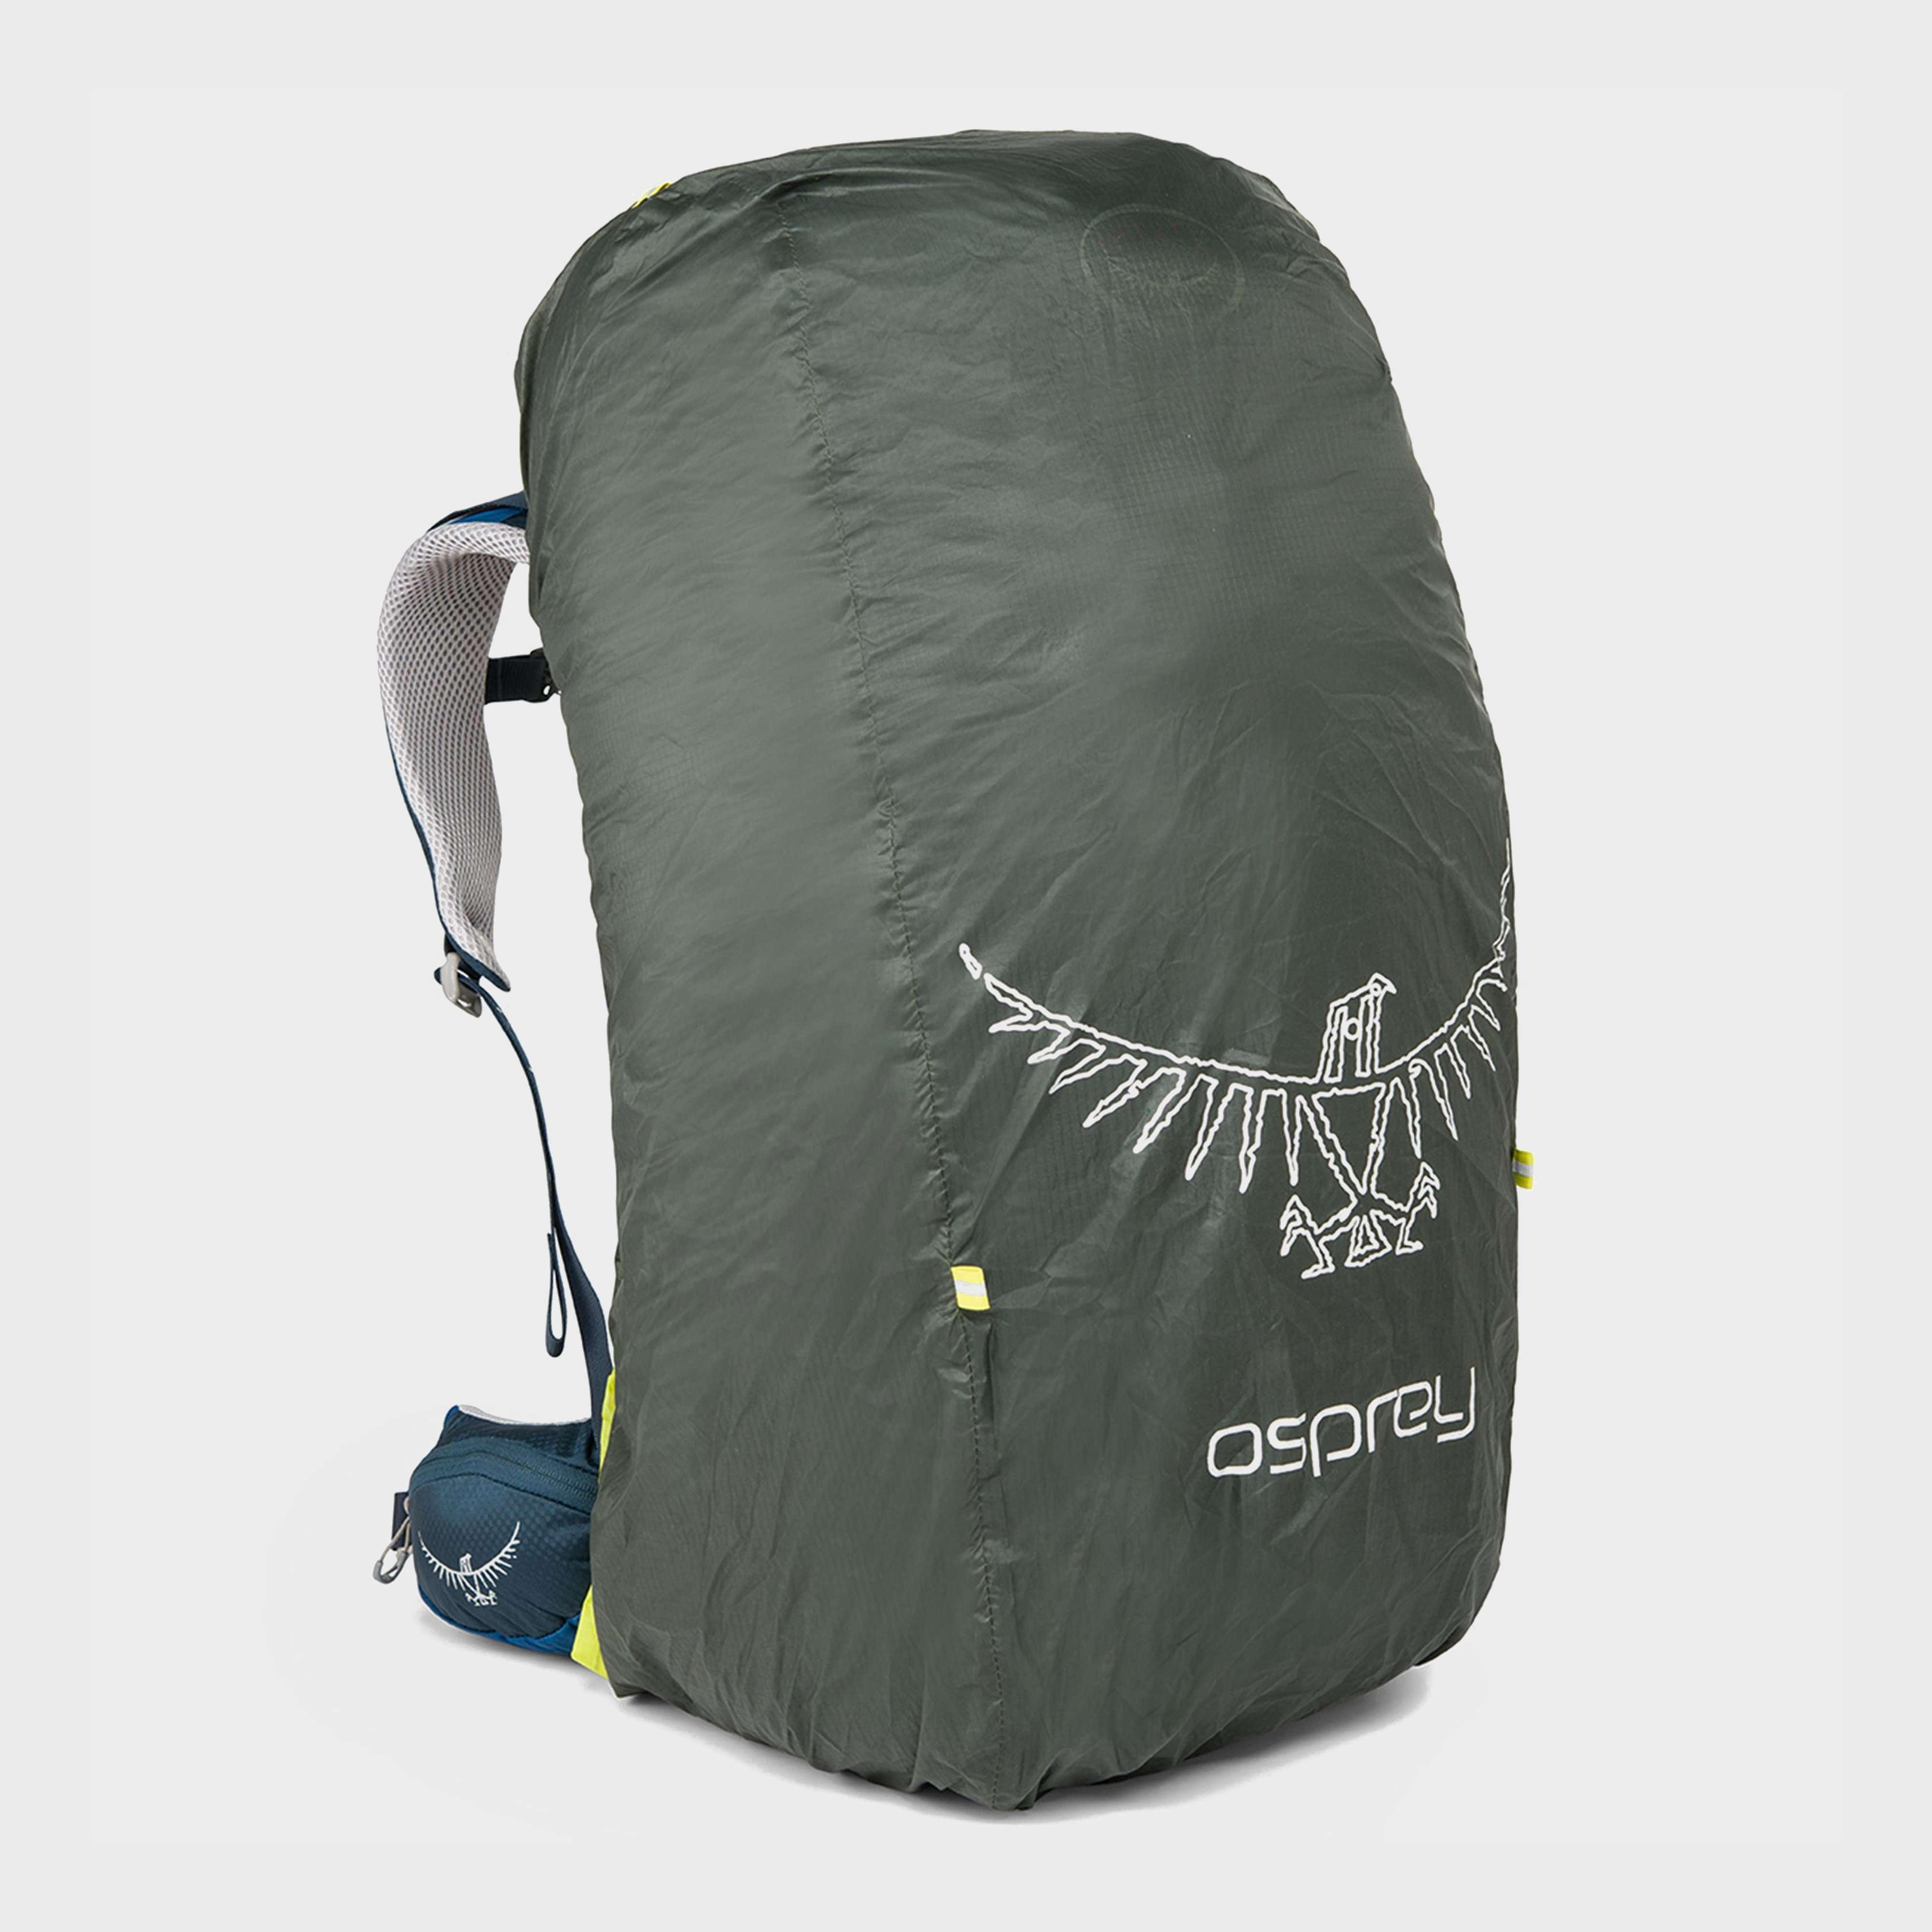 OSPREY Ultralight Raincover L 50-75L